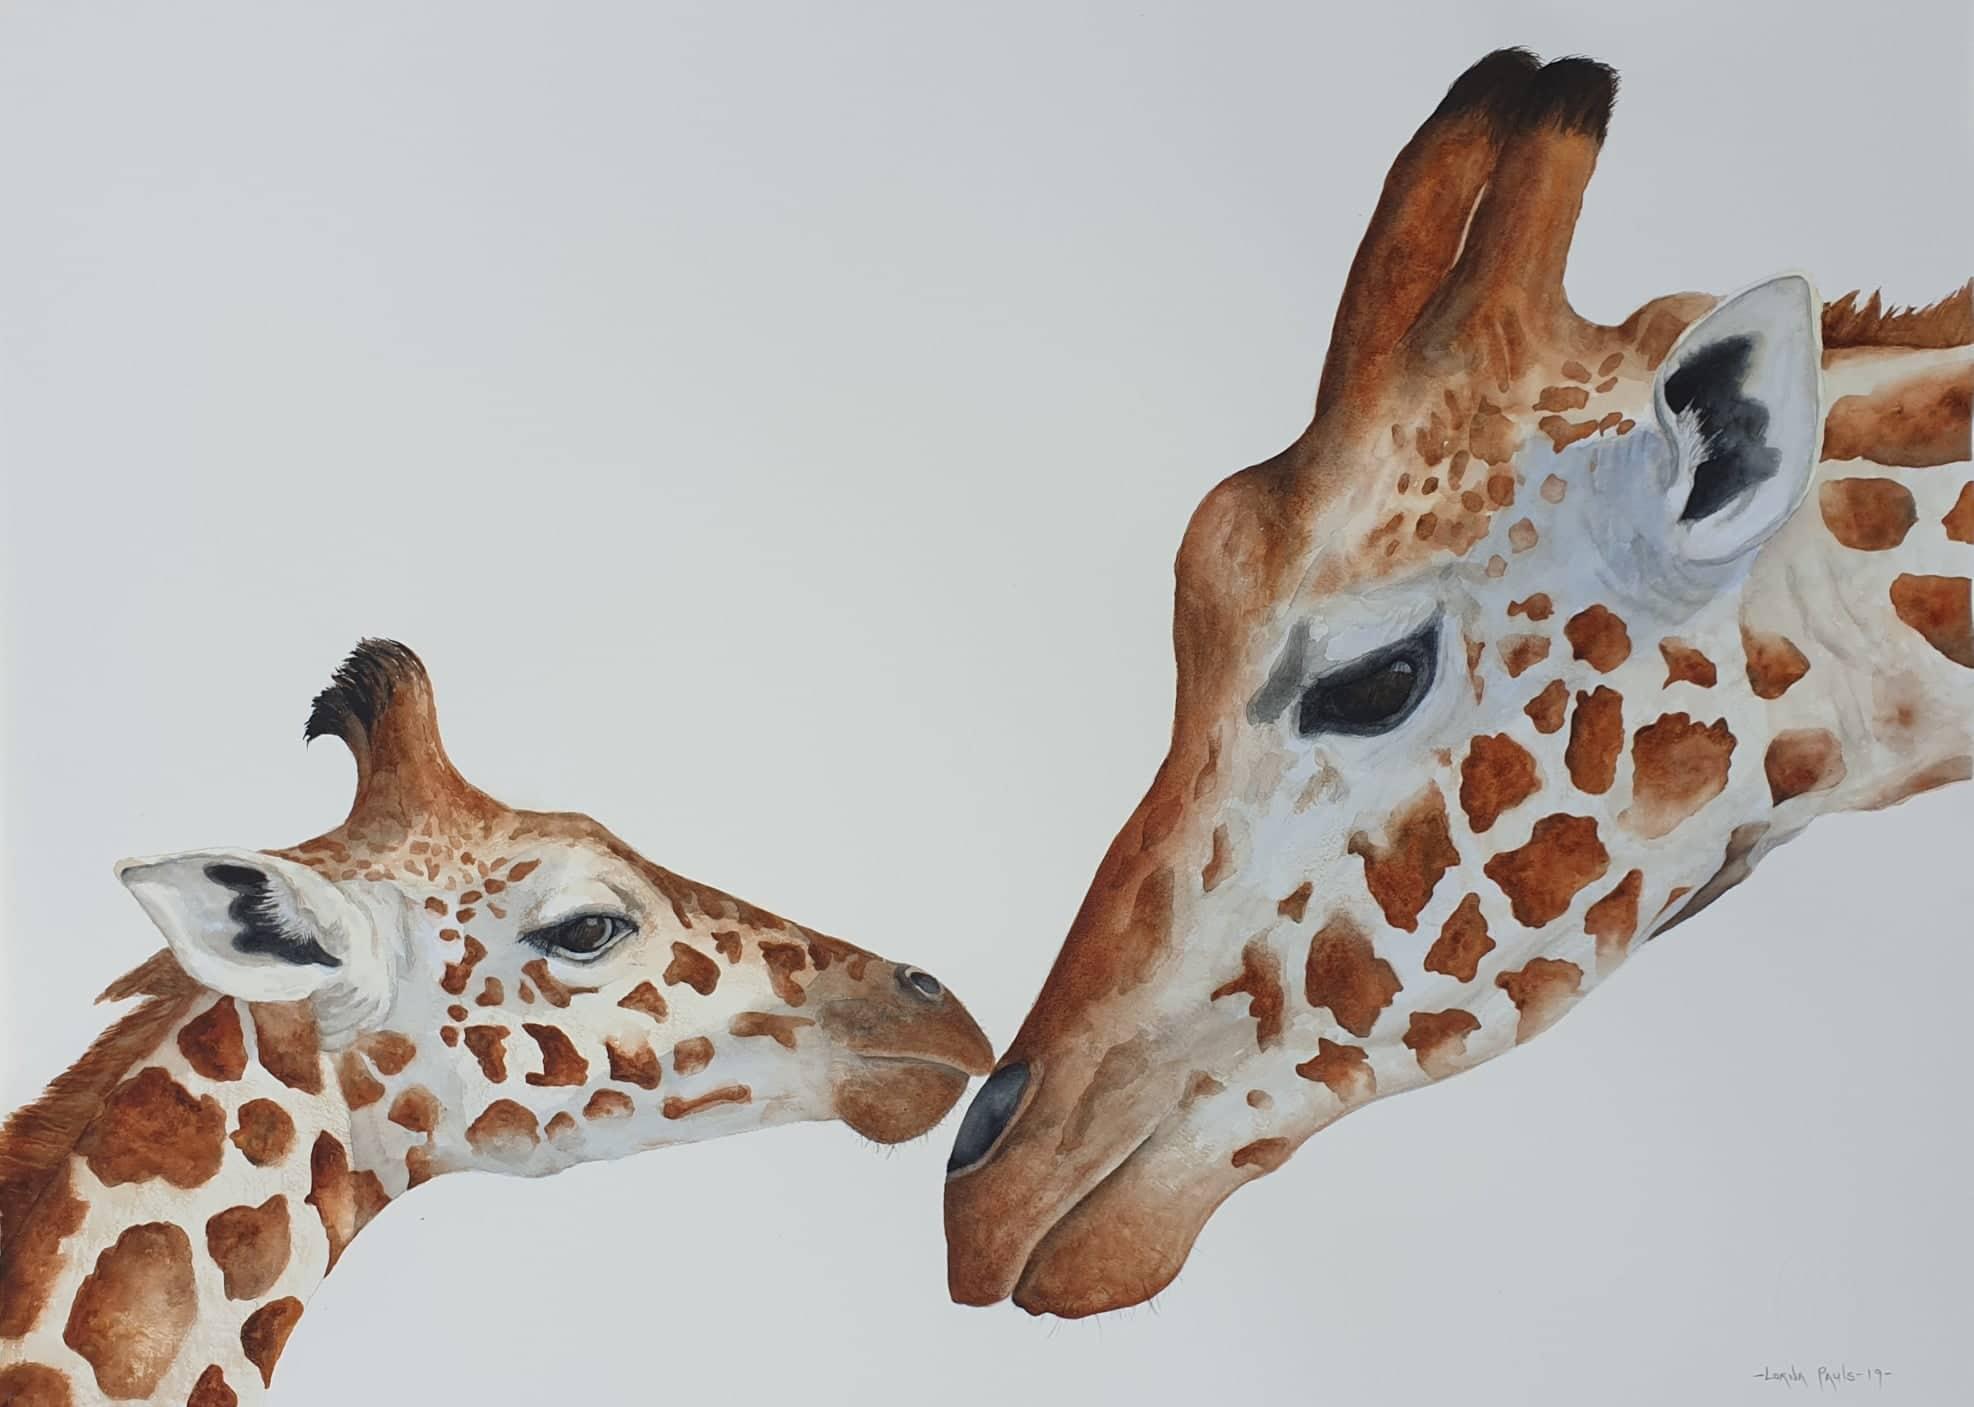 Aquarel of Giraffe adult and calf in endearing pose